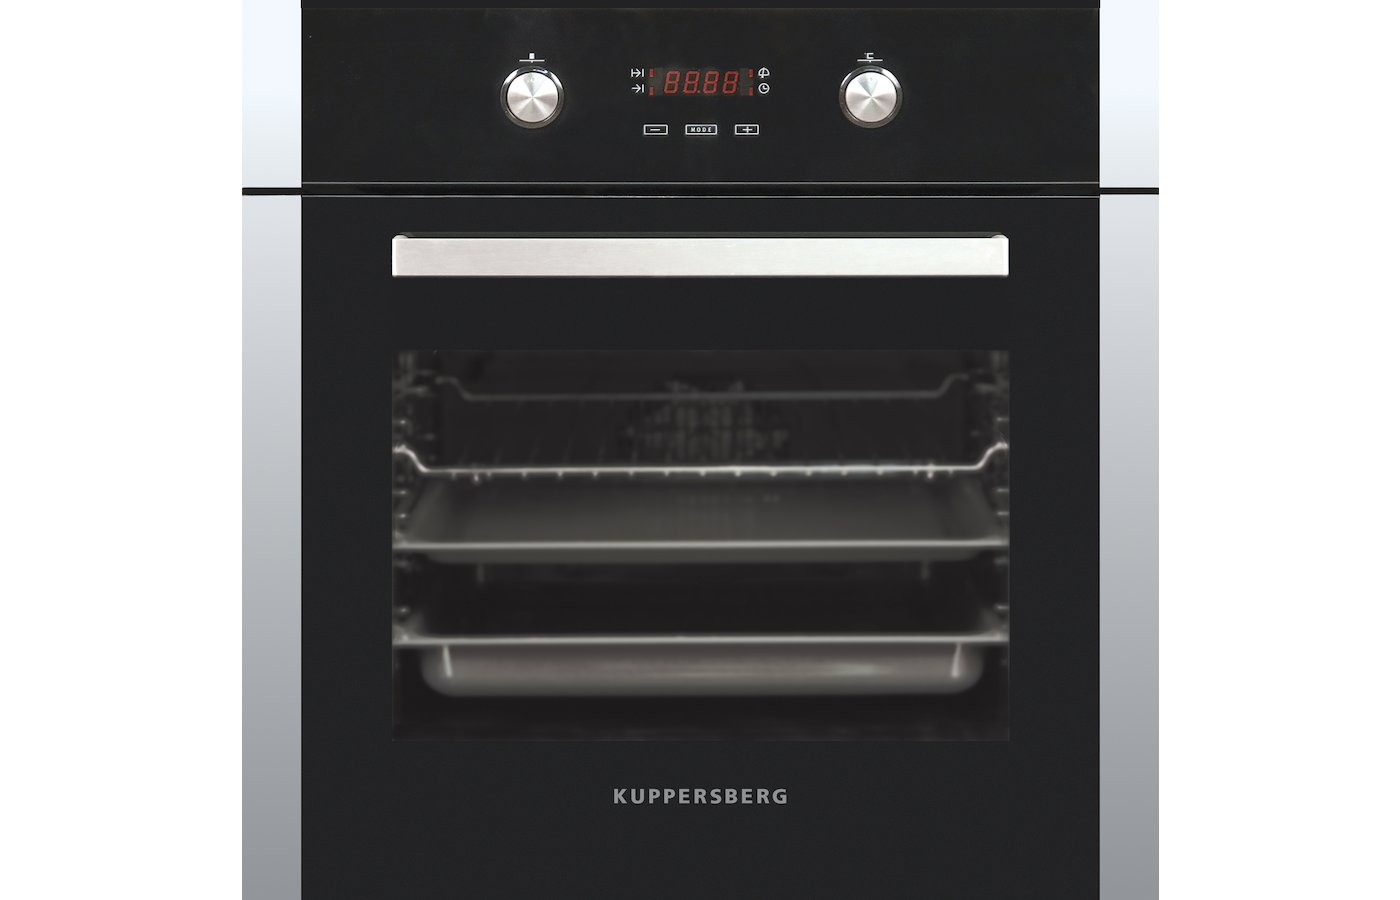 Духовой шкаф KUPPERSBERG HA 663 T